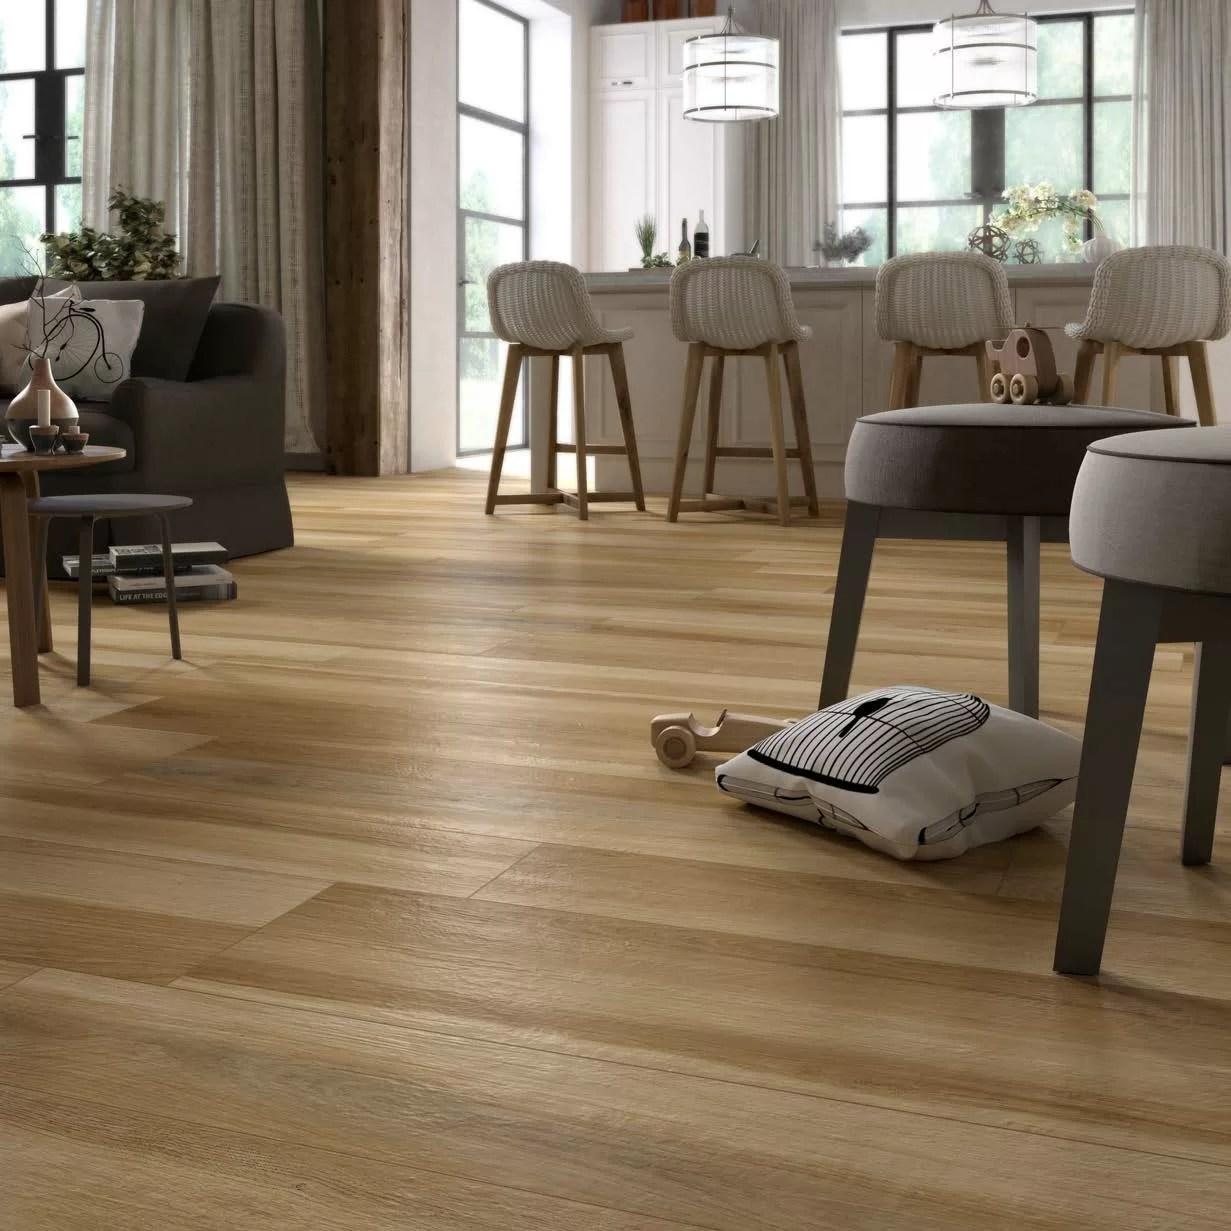 trevi 8 x 48 porcelain wood look tile